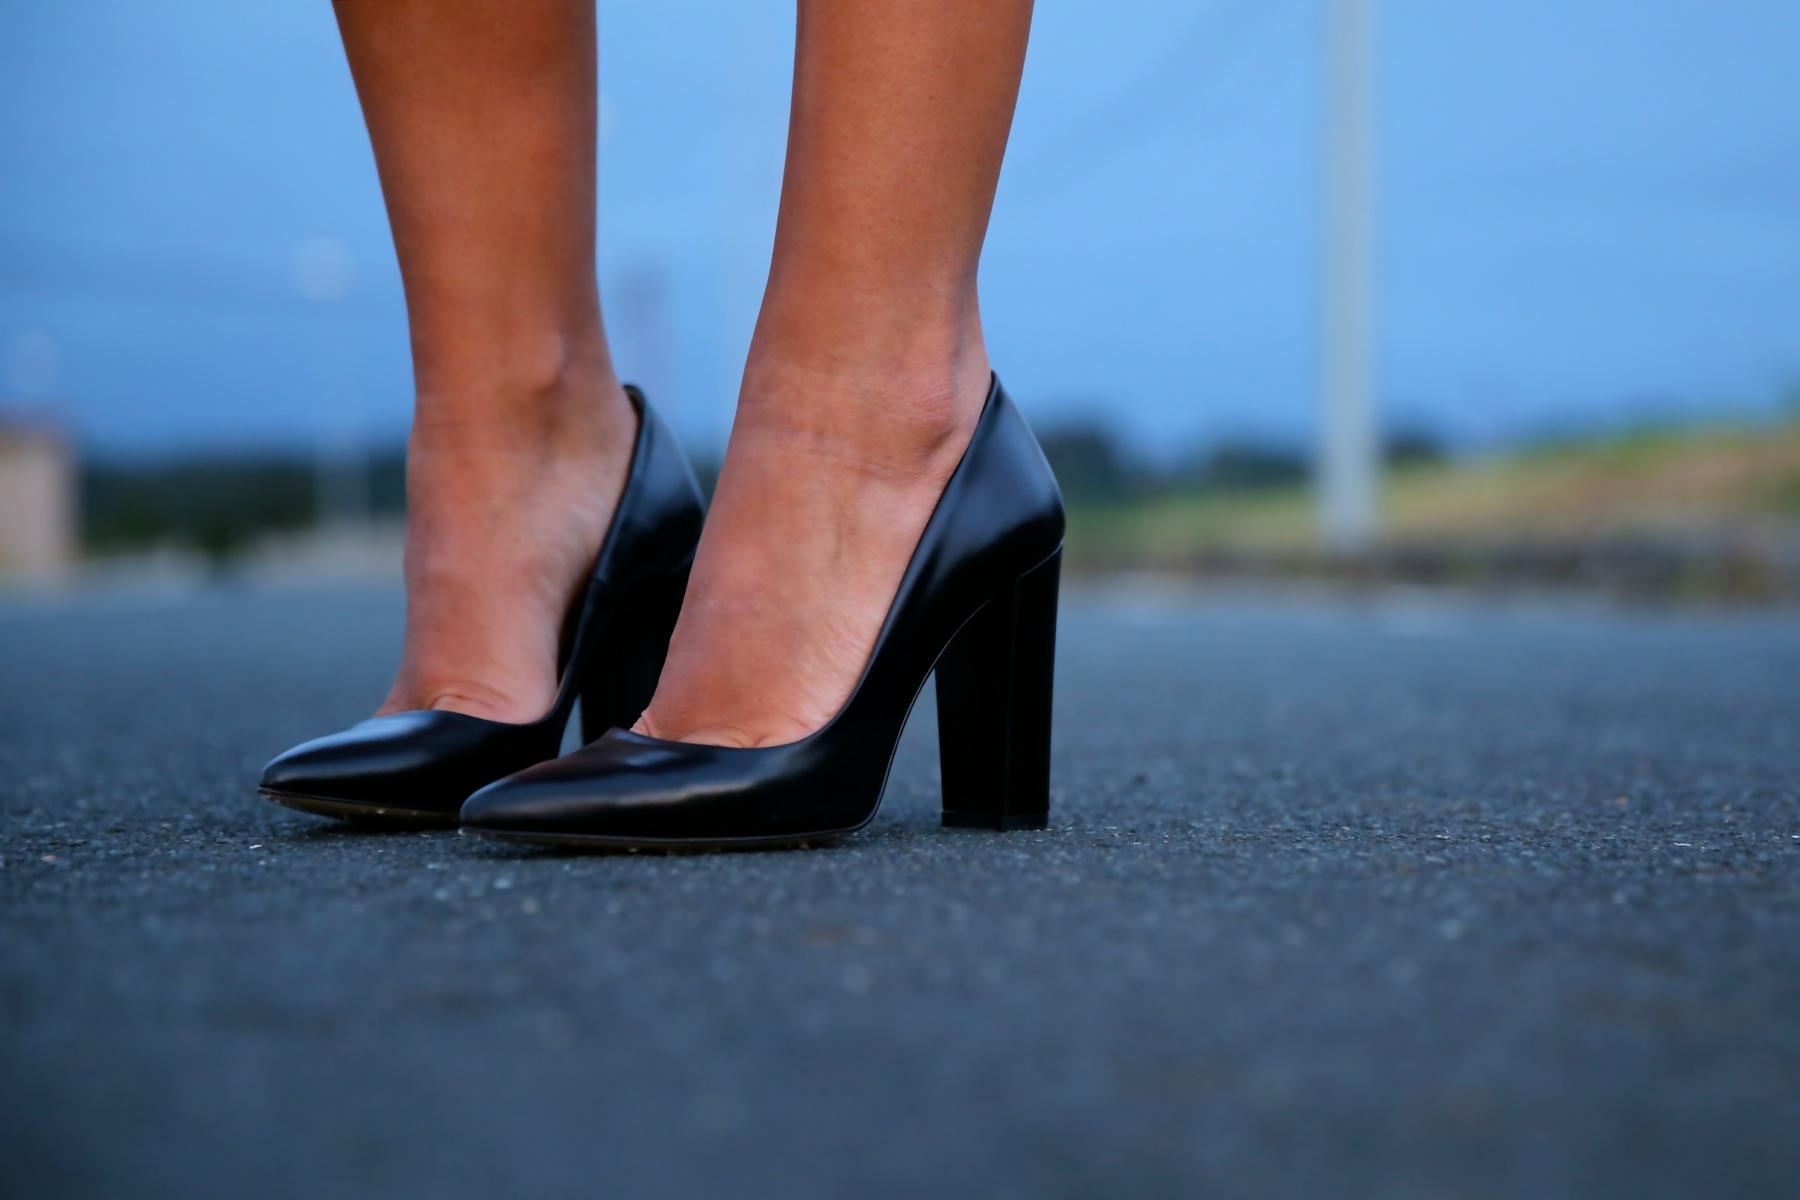 trendy_taste-look-outfit-street_style-ootd-blog-blogger-fashion_spain-moda_españa-denim_shorts-shorts_vaqueros-chaqueta_cuero-leather_jacket-ysl-saint_laurent-1